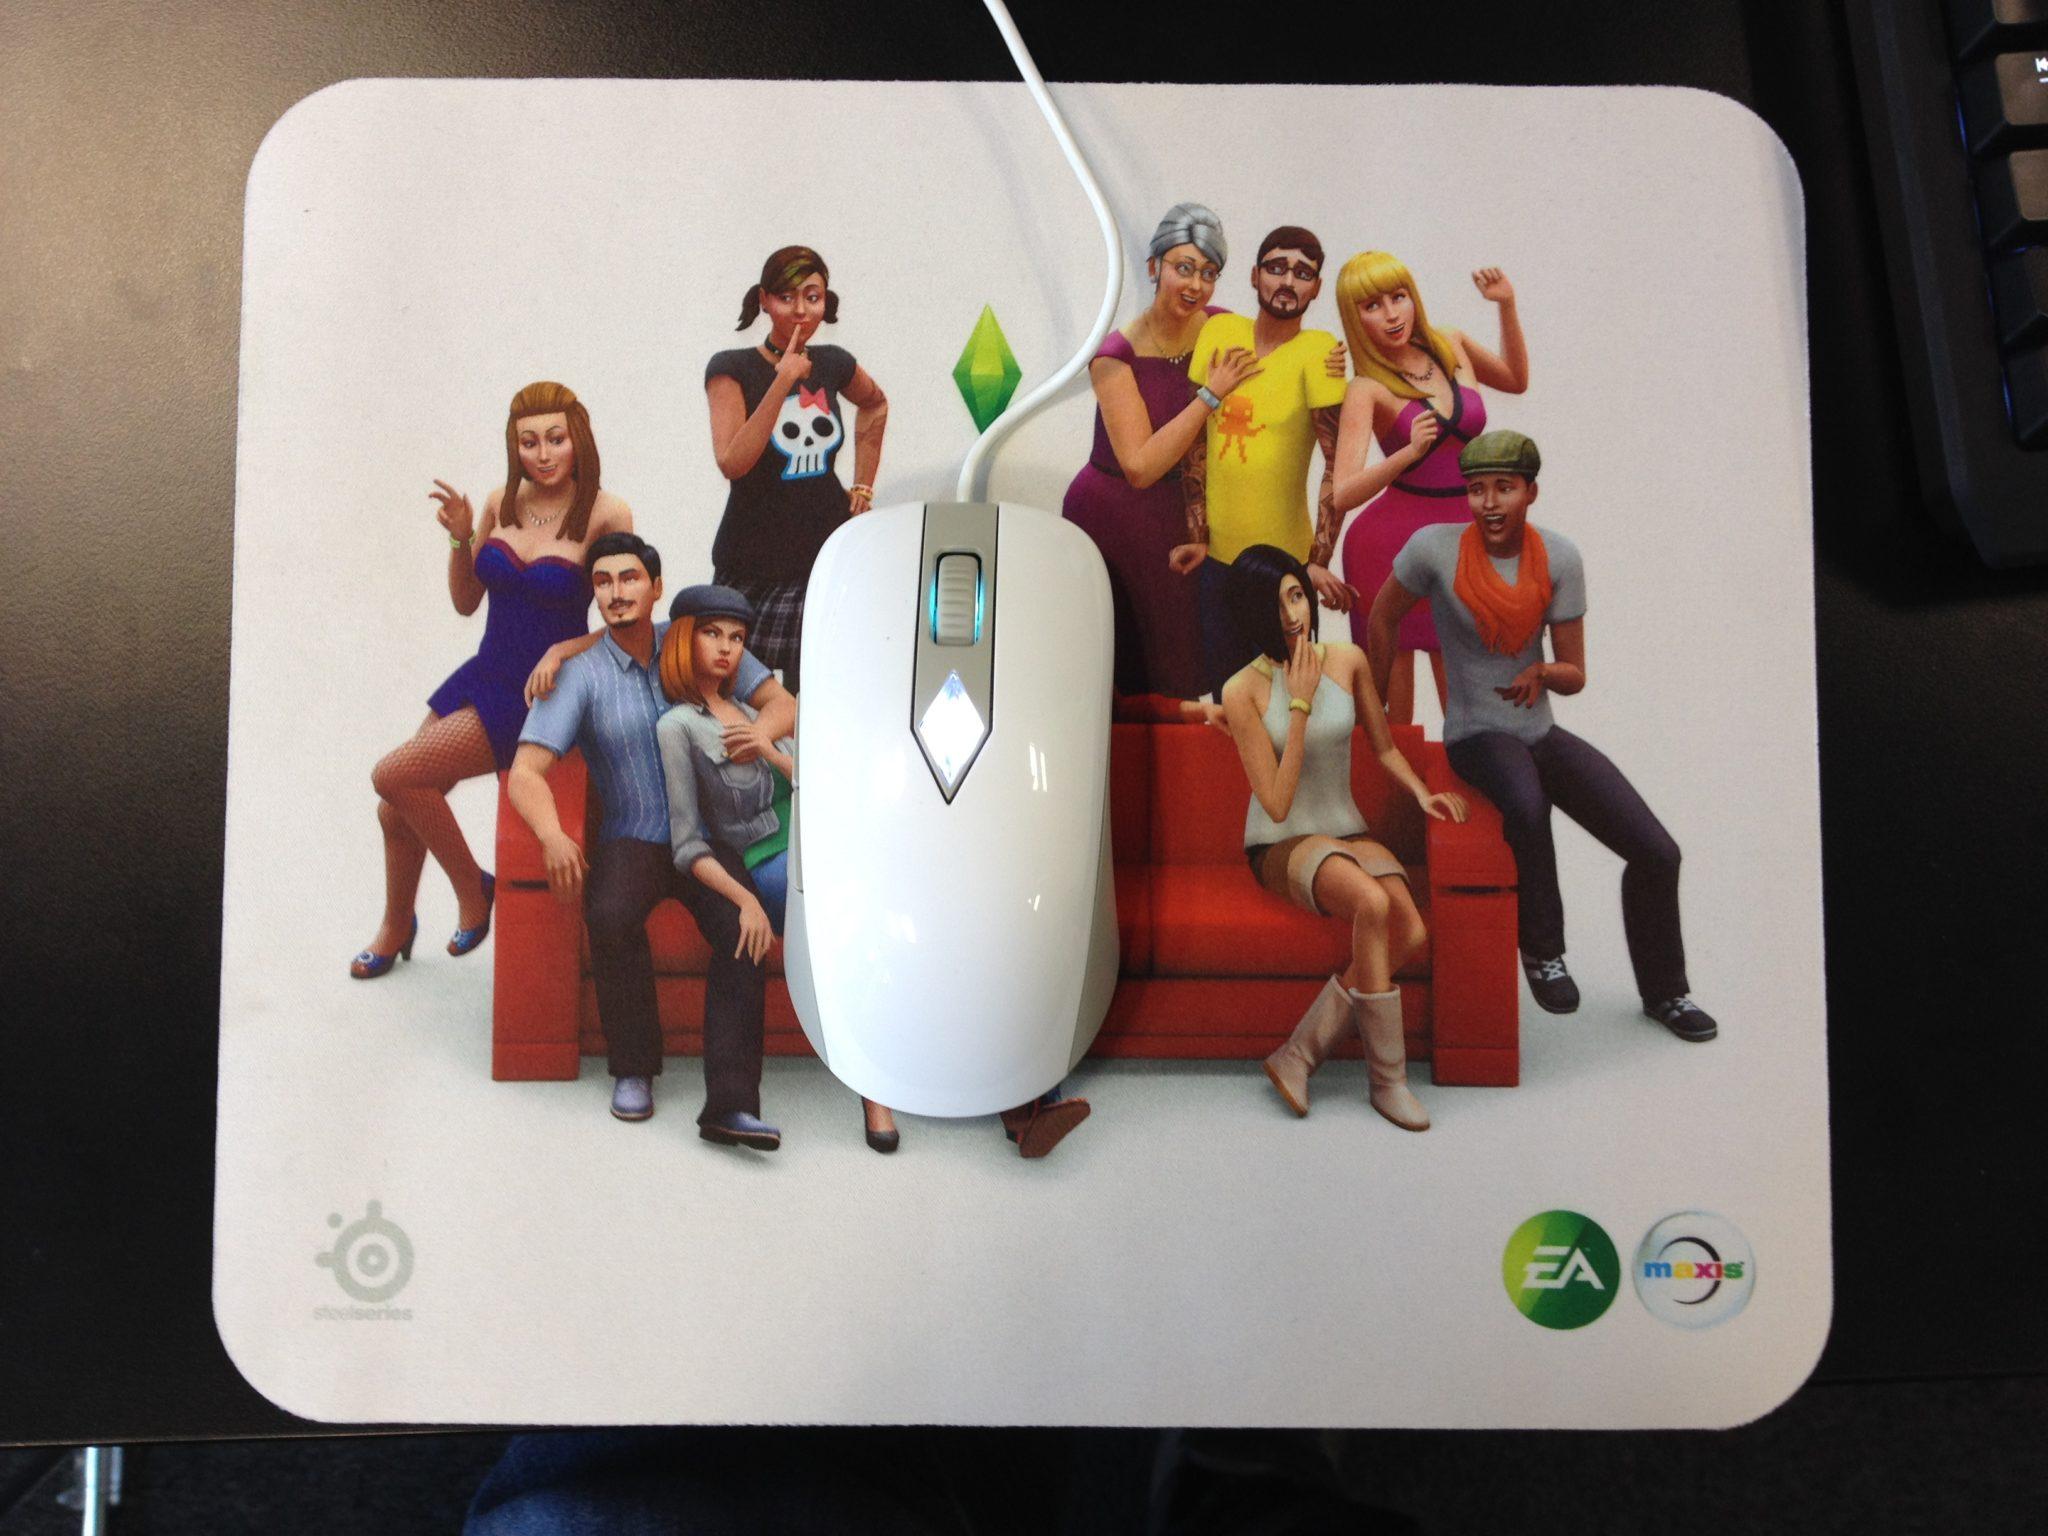 Sims 4 vivre ensemble groupe